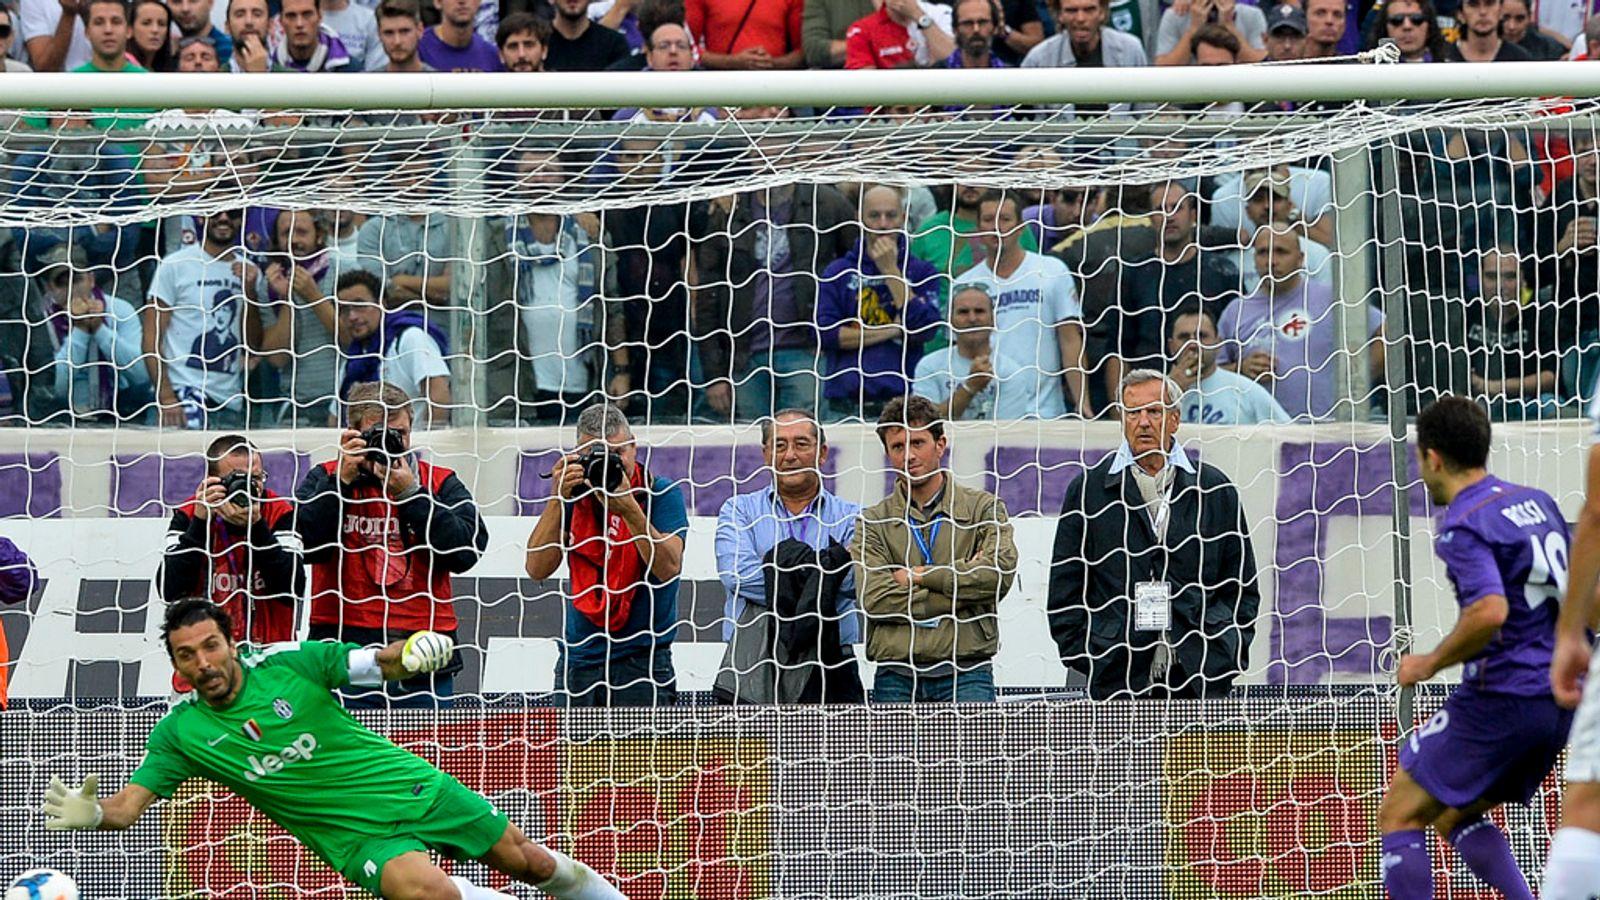 Fiorentina-v-Juventus-Giuseppe-Rossi-goal_3022069